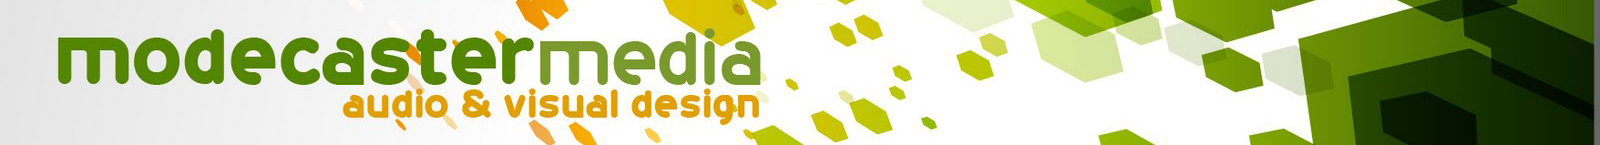 Modecaster media blog